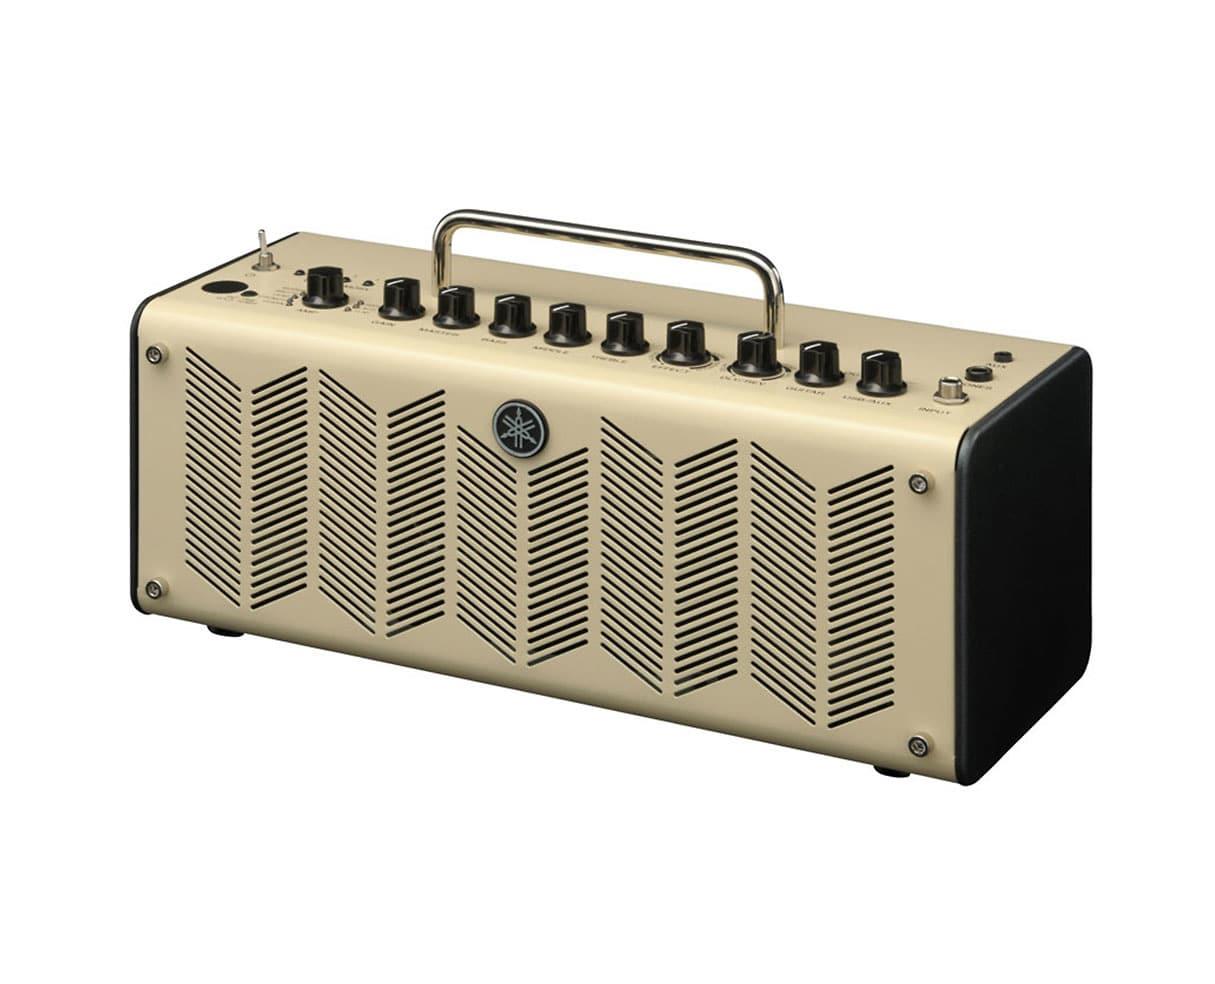 Yamaha thr10 10 watt desktop guitar amplifier for Yamaha thr amplifier